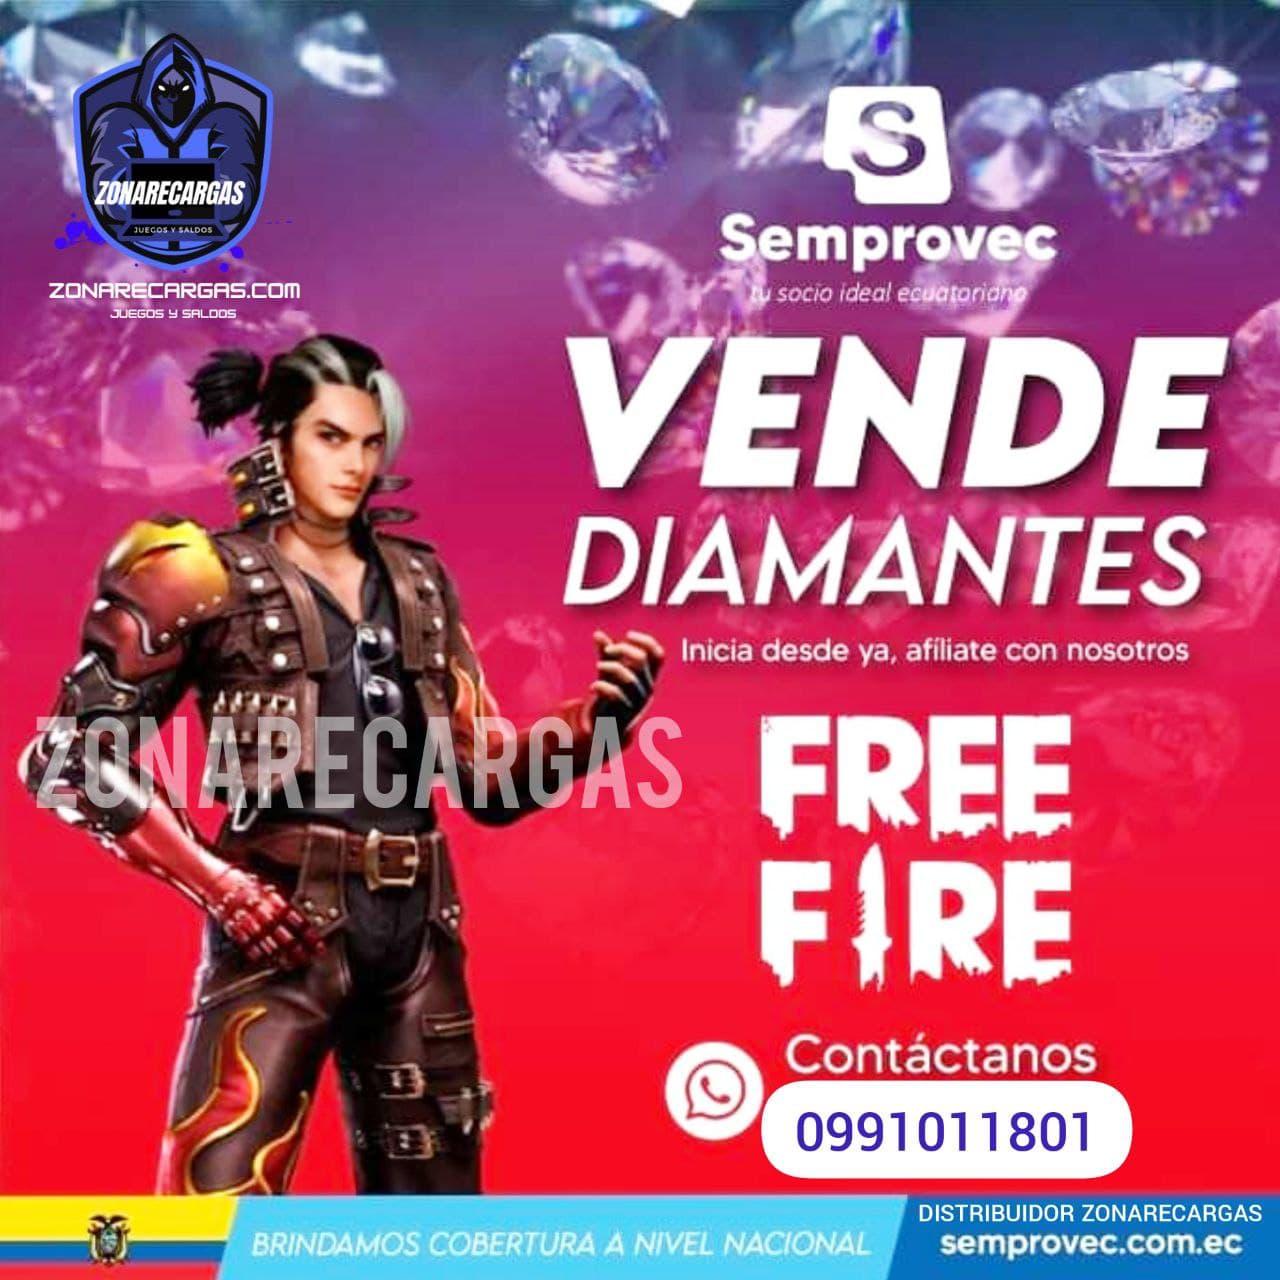 vende recargas free fire